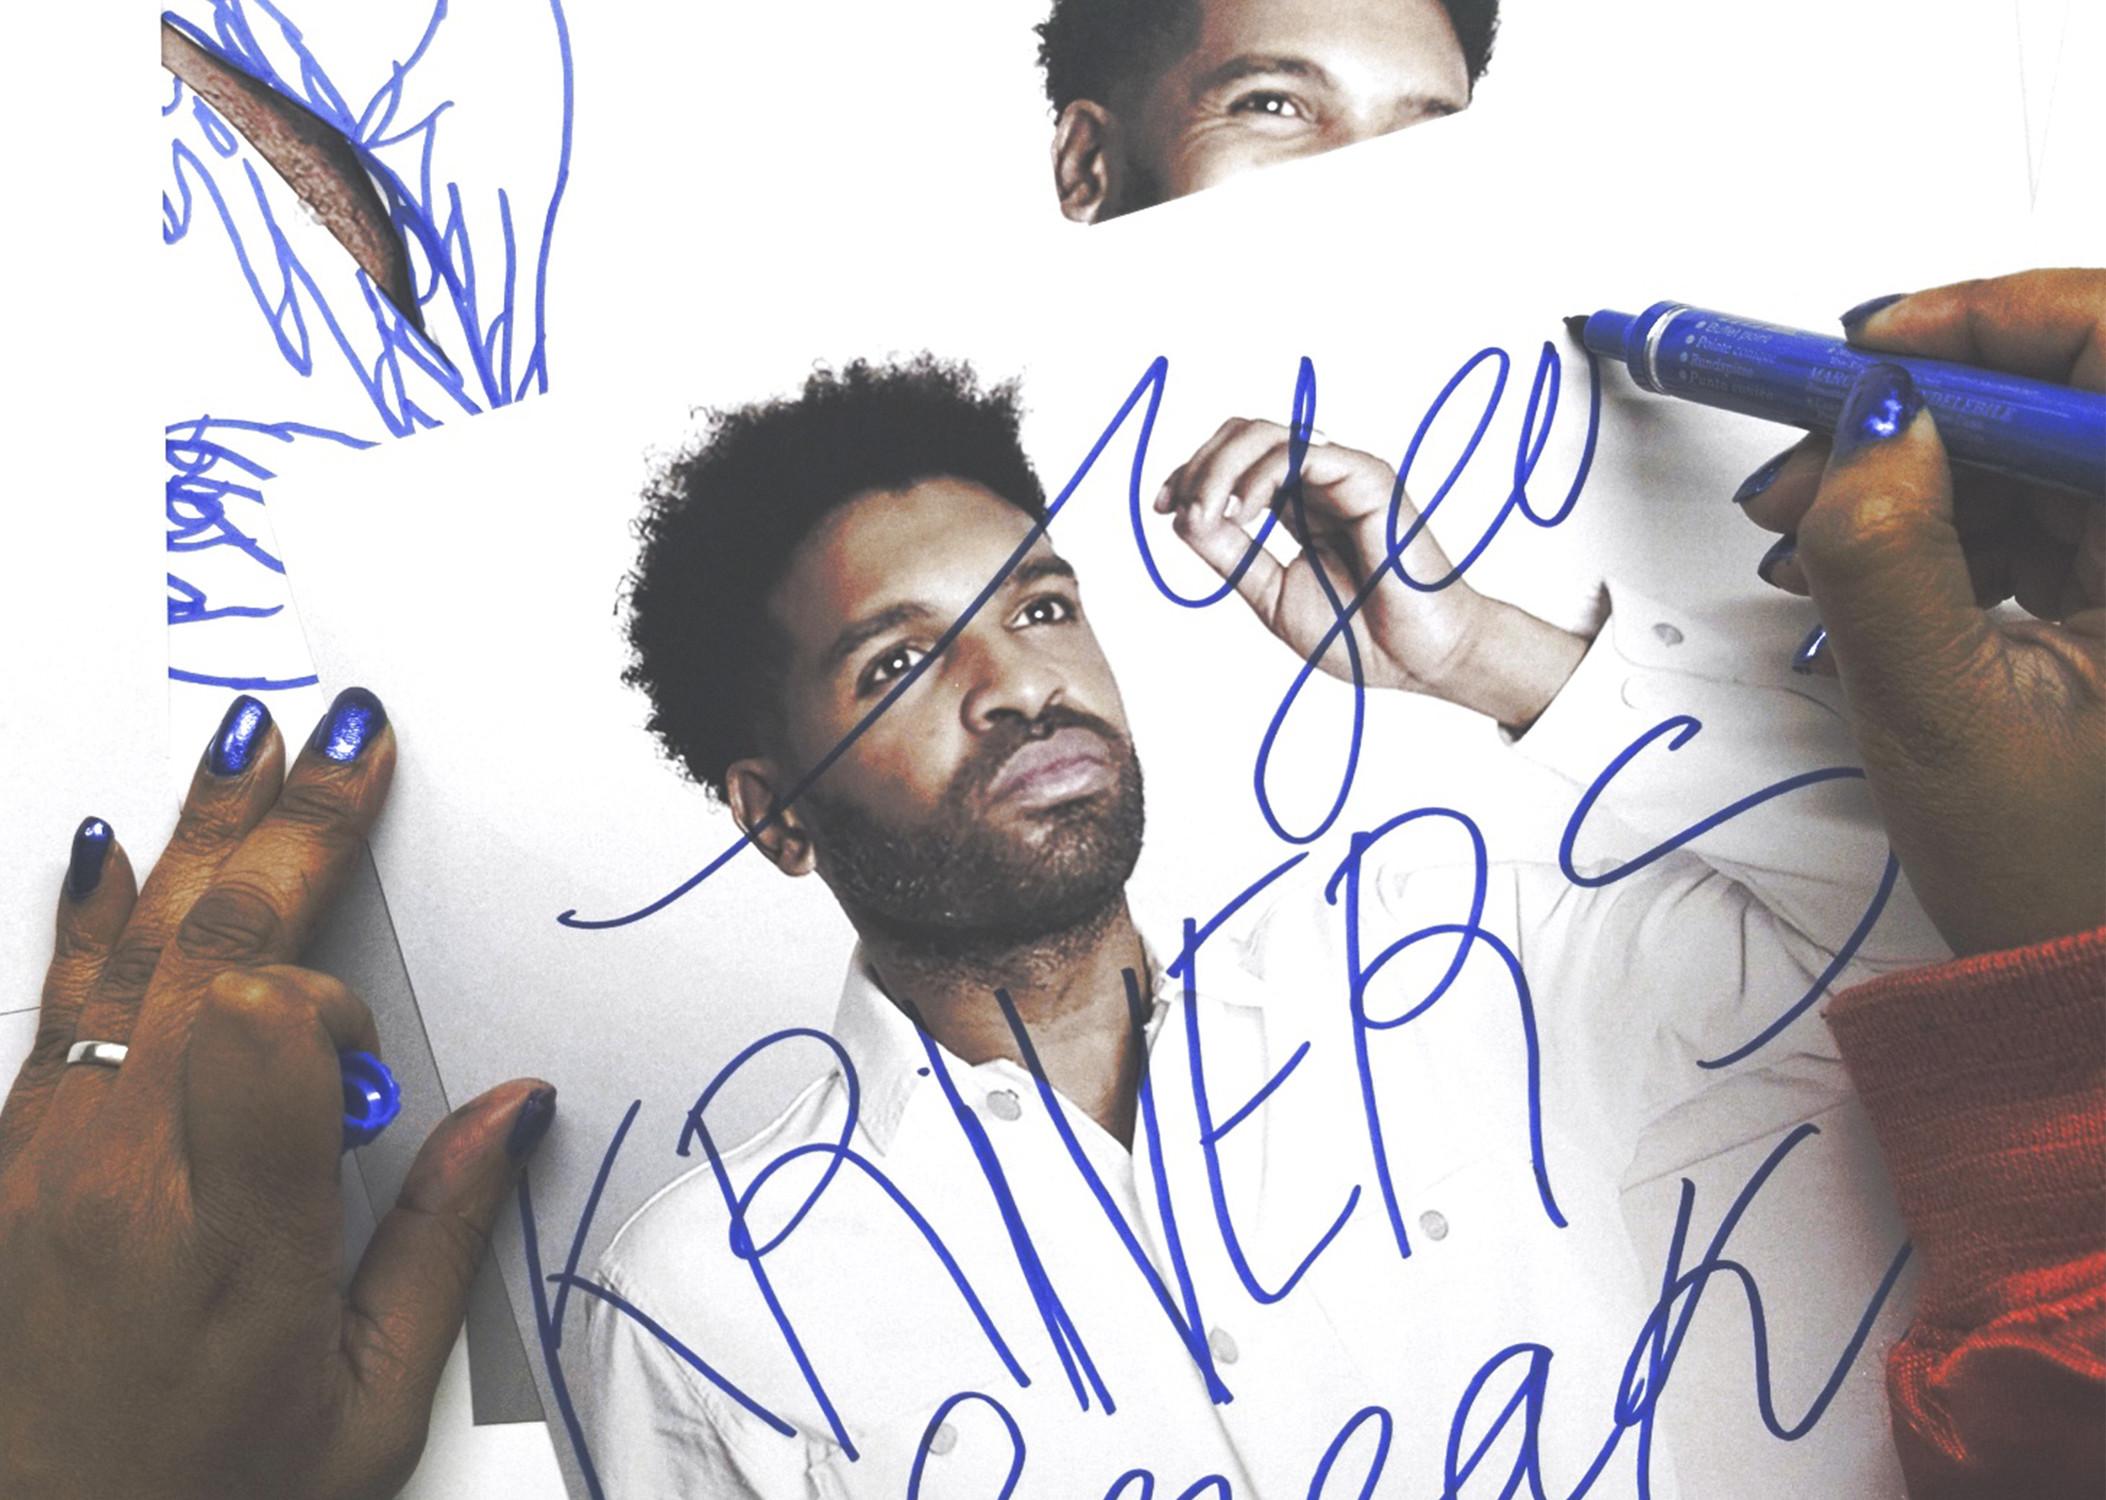 KRIVERS, collaboration VAVA DUDU - © Bigtime.